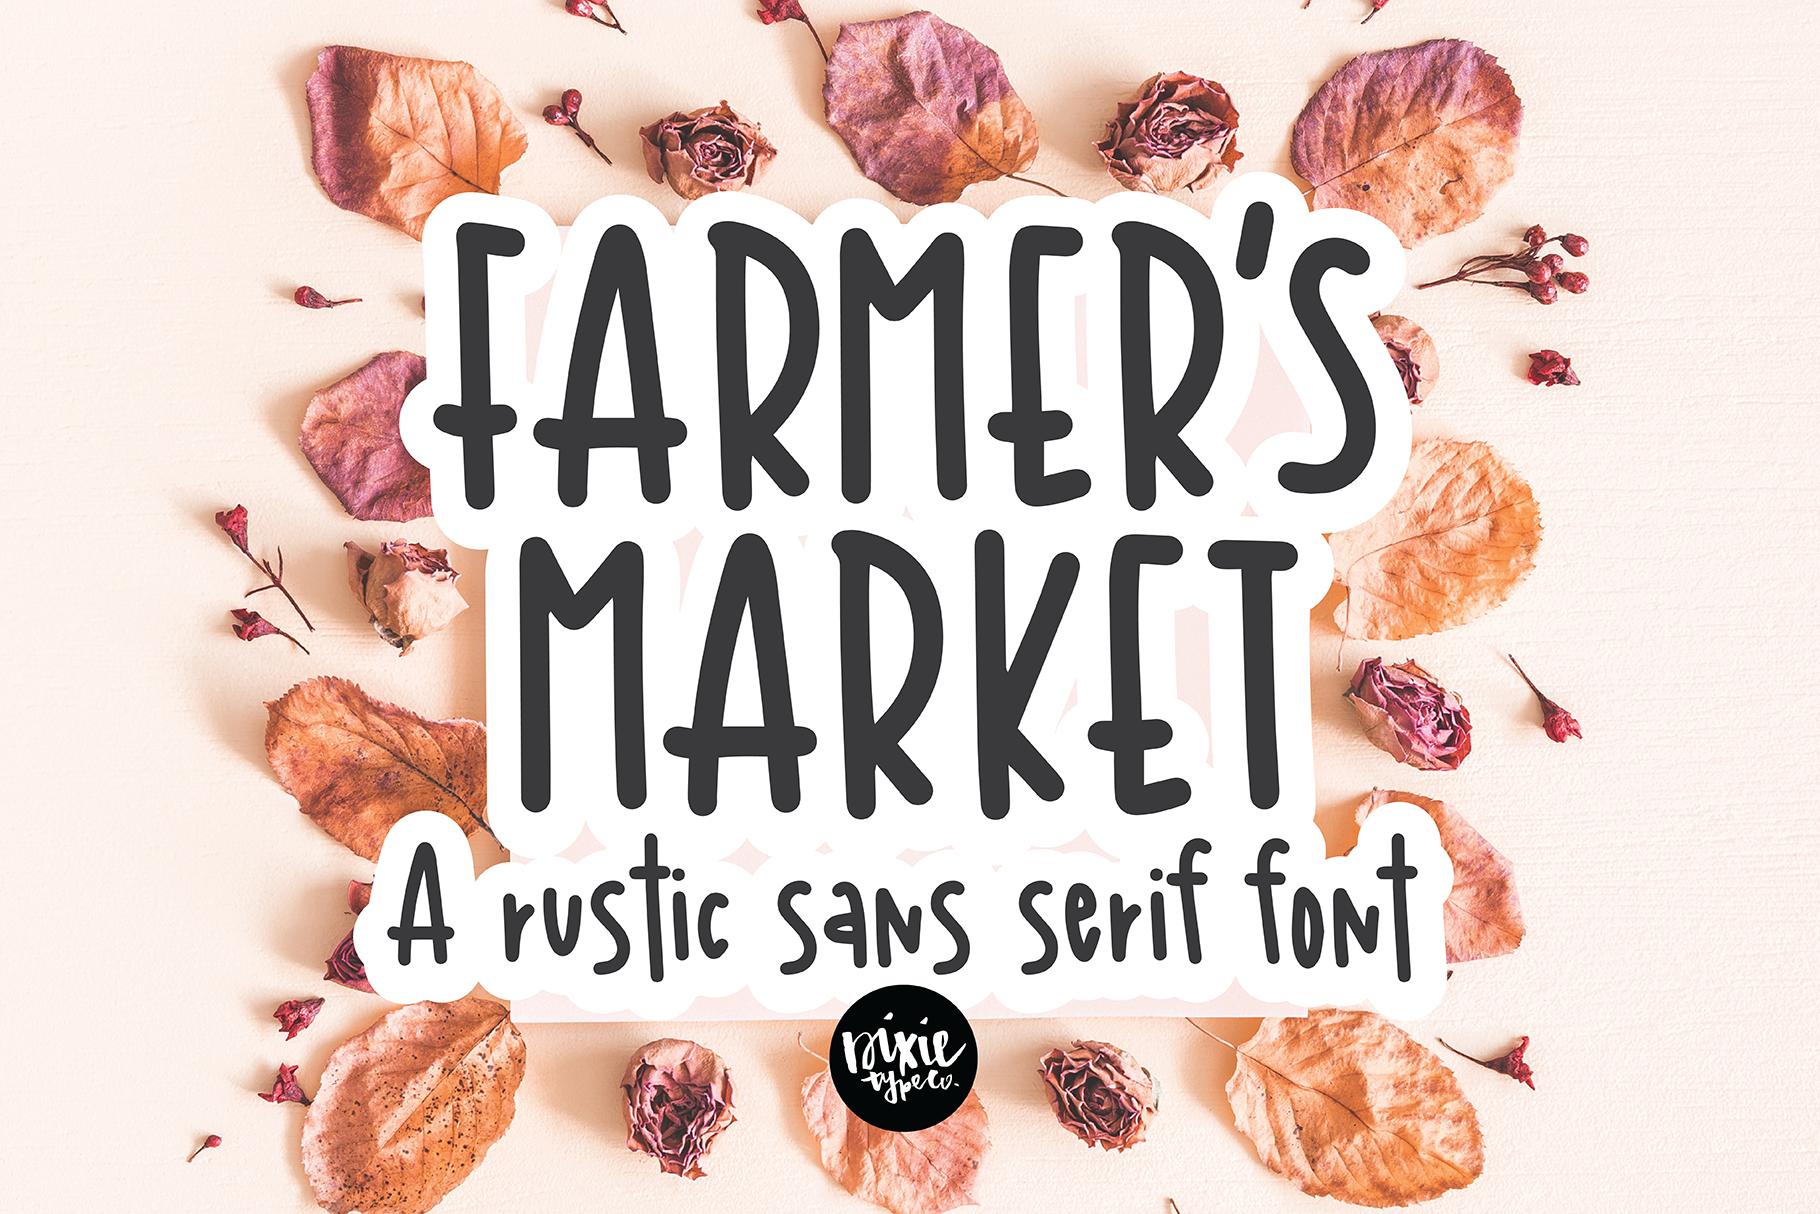 FARMER'S MARKET a Rustic Sans Serif Font example image 1